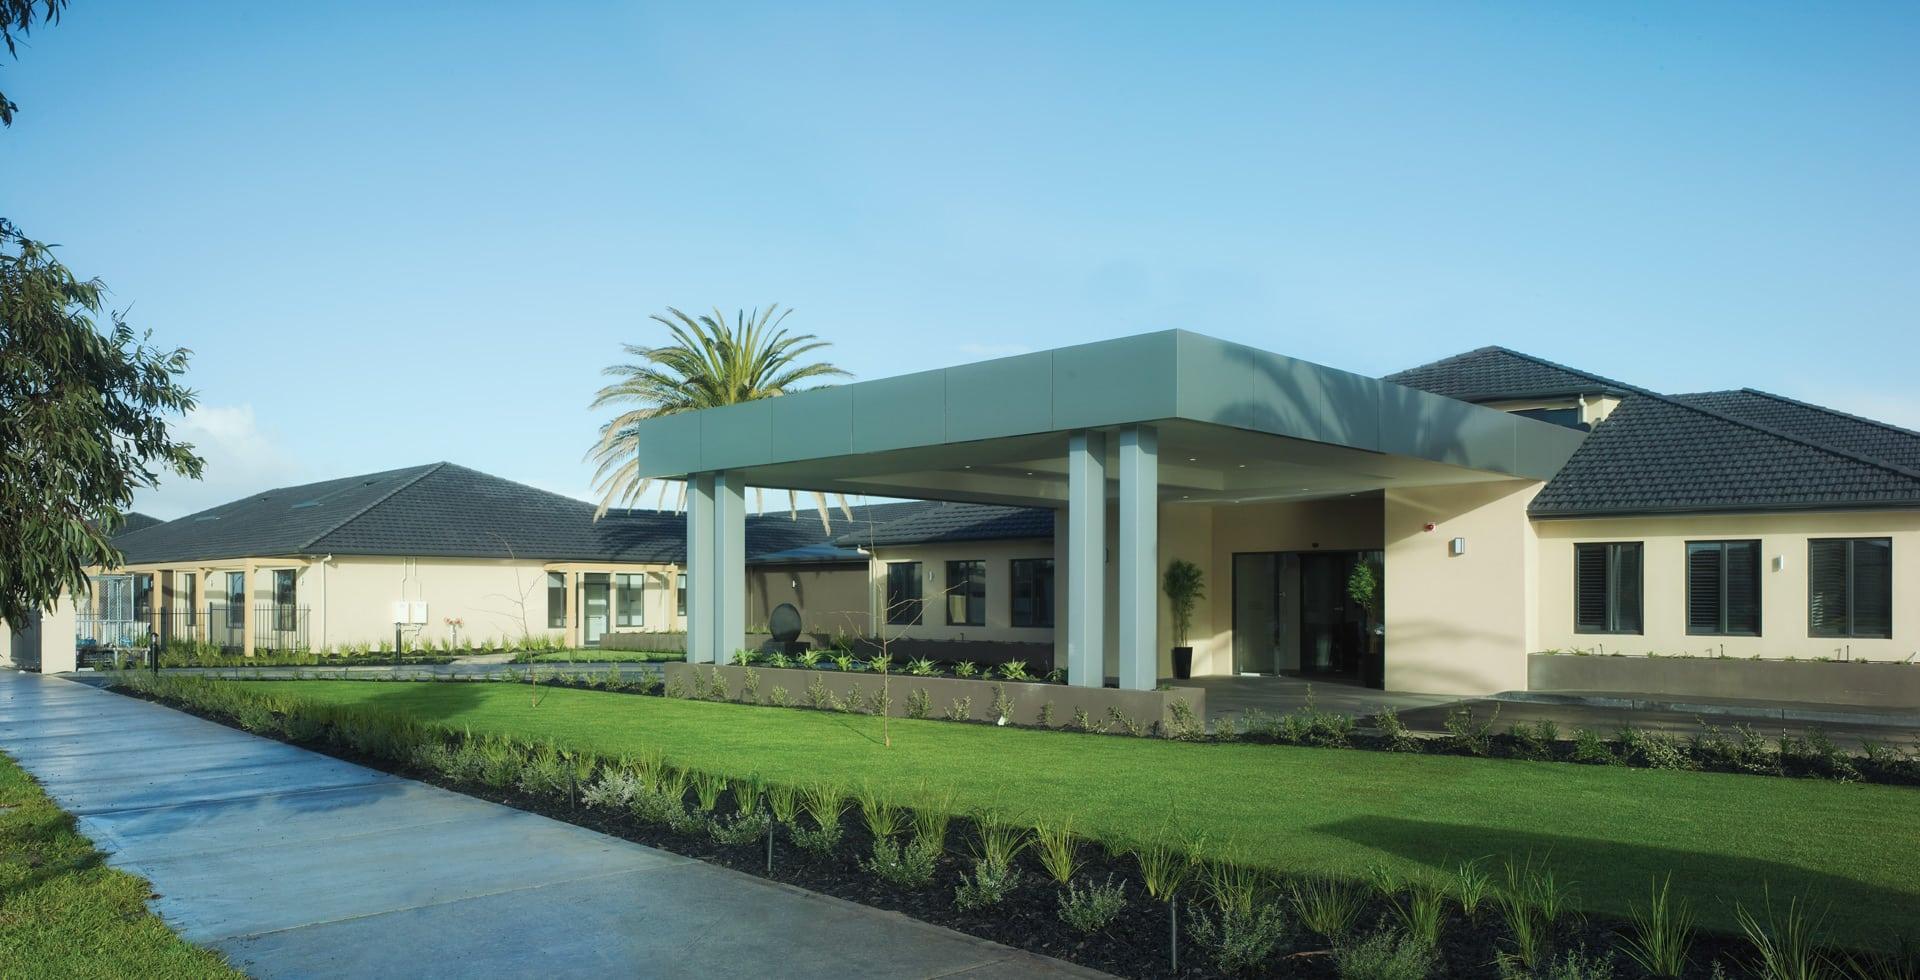 Arcare Waterview (in Craigieburn) Aged Care